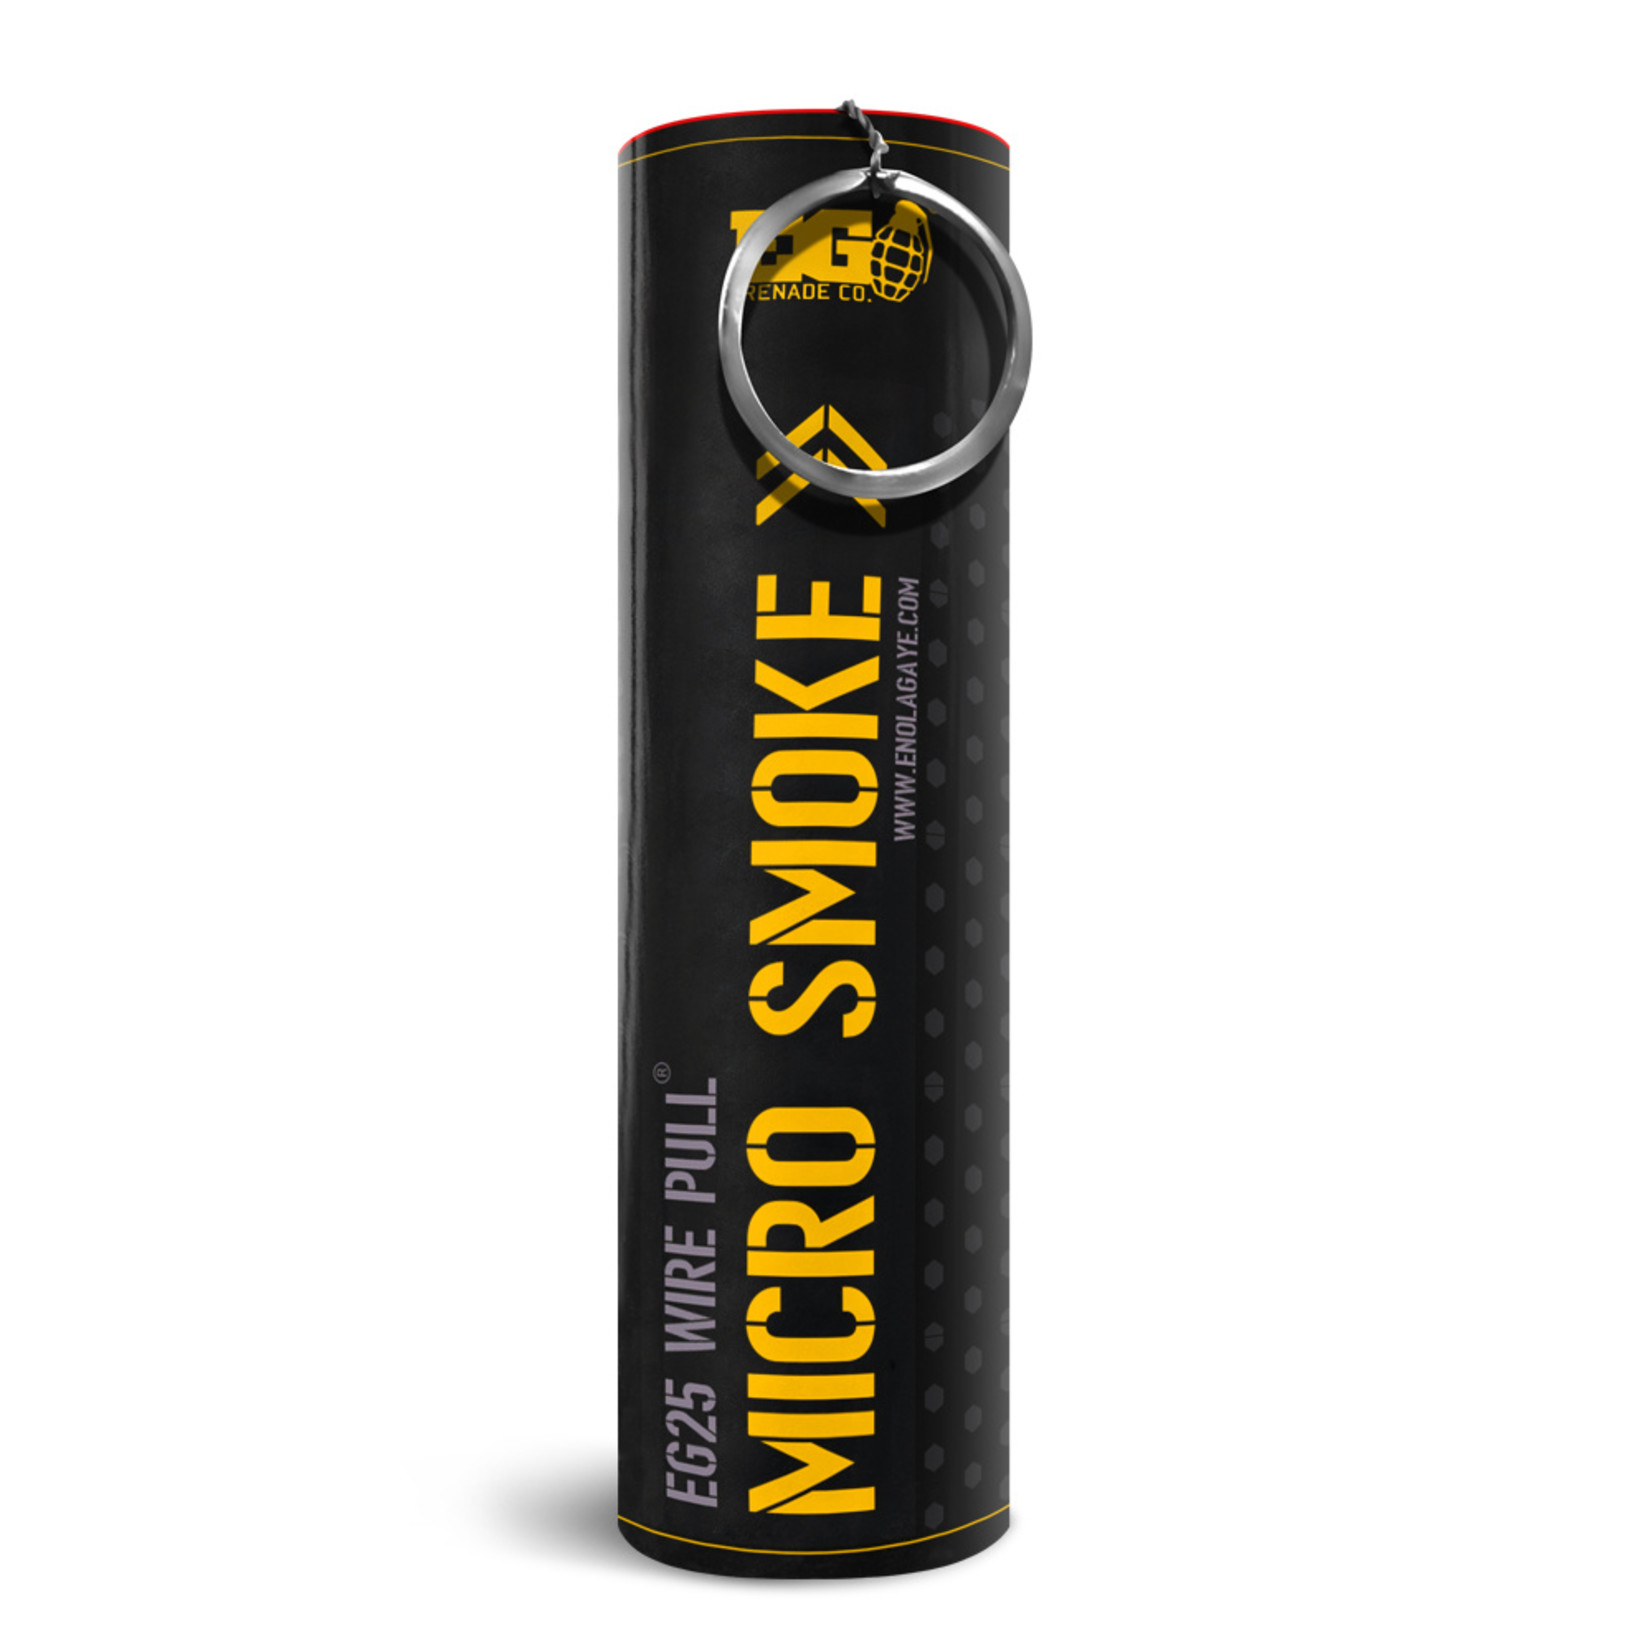 EG25 Micro Smoke Grenade Yellow